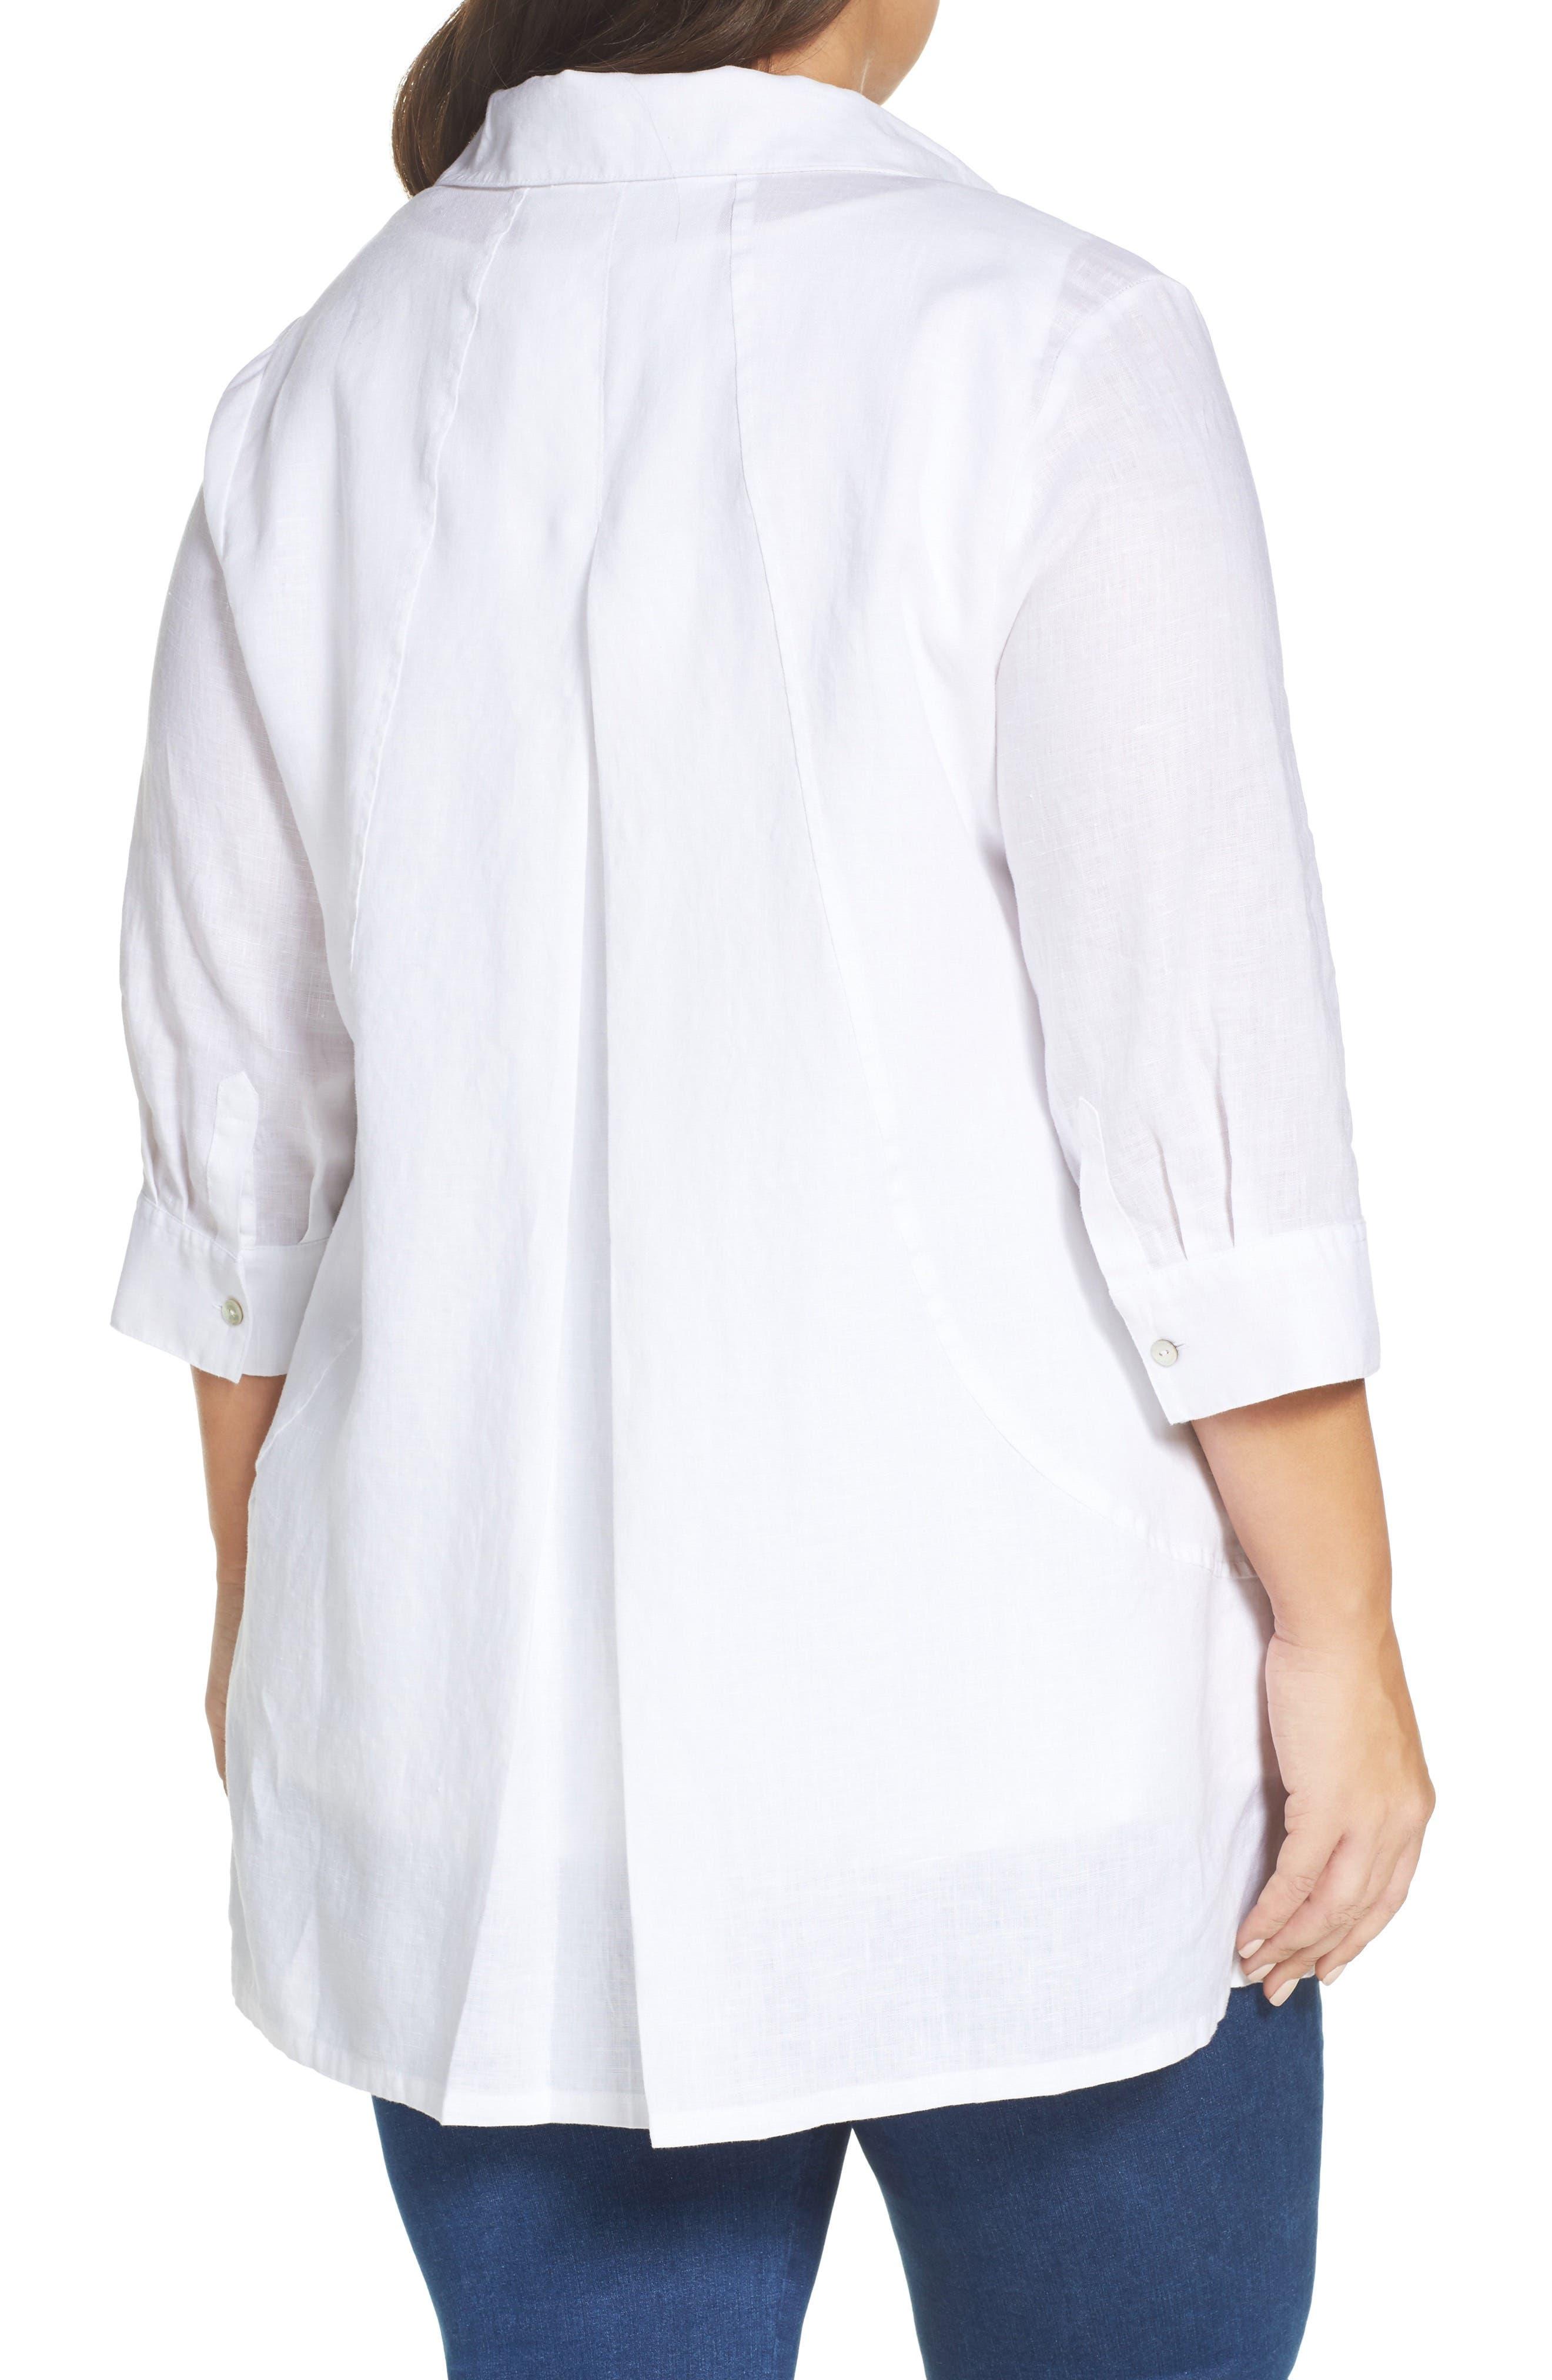 Skye Linen Tunic Shirt,                             Alternate thumbnail 2, color,                             100